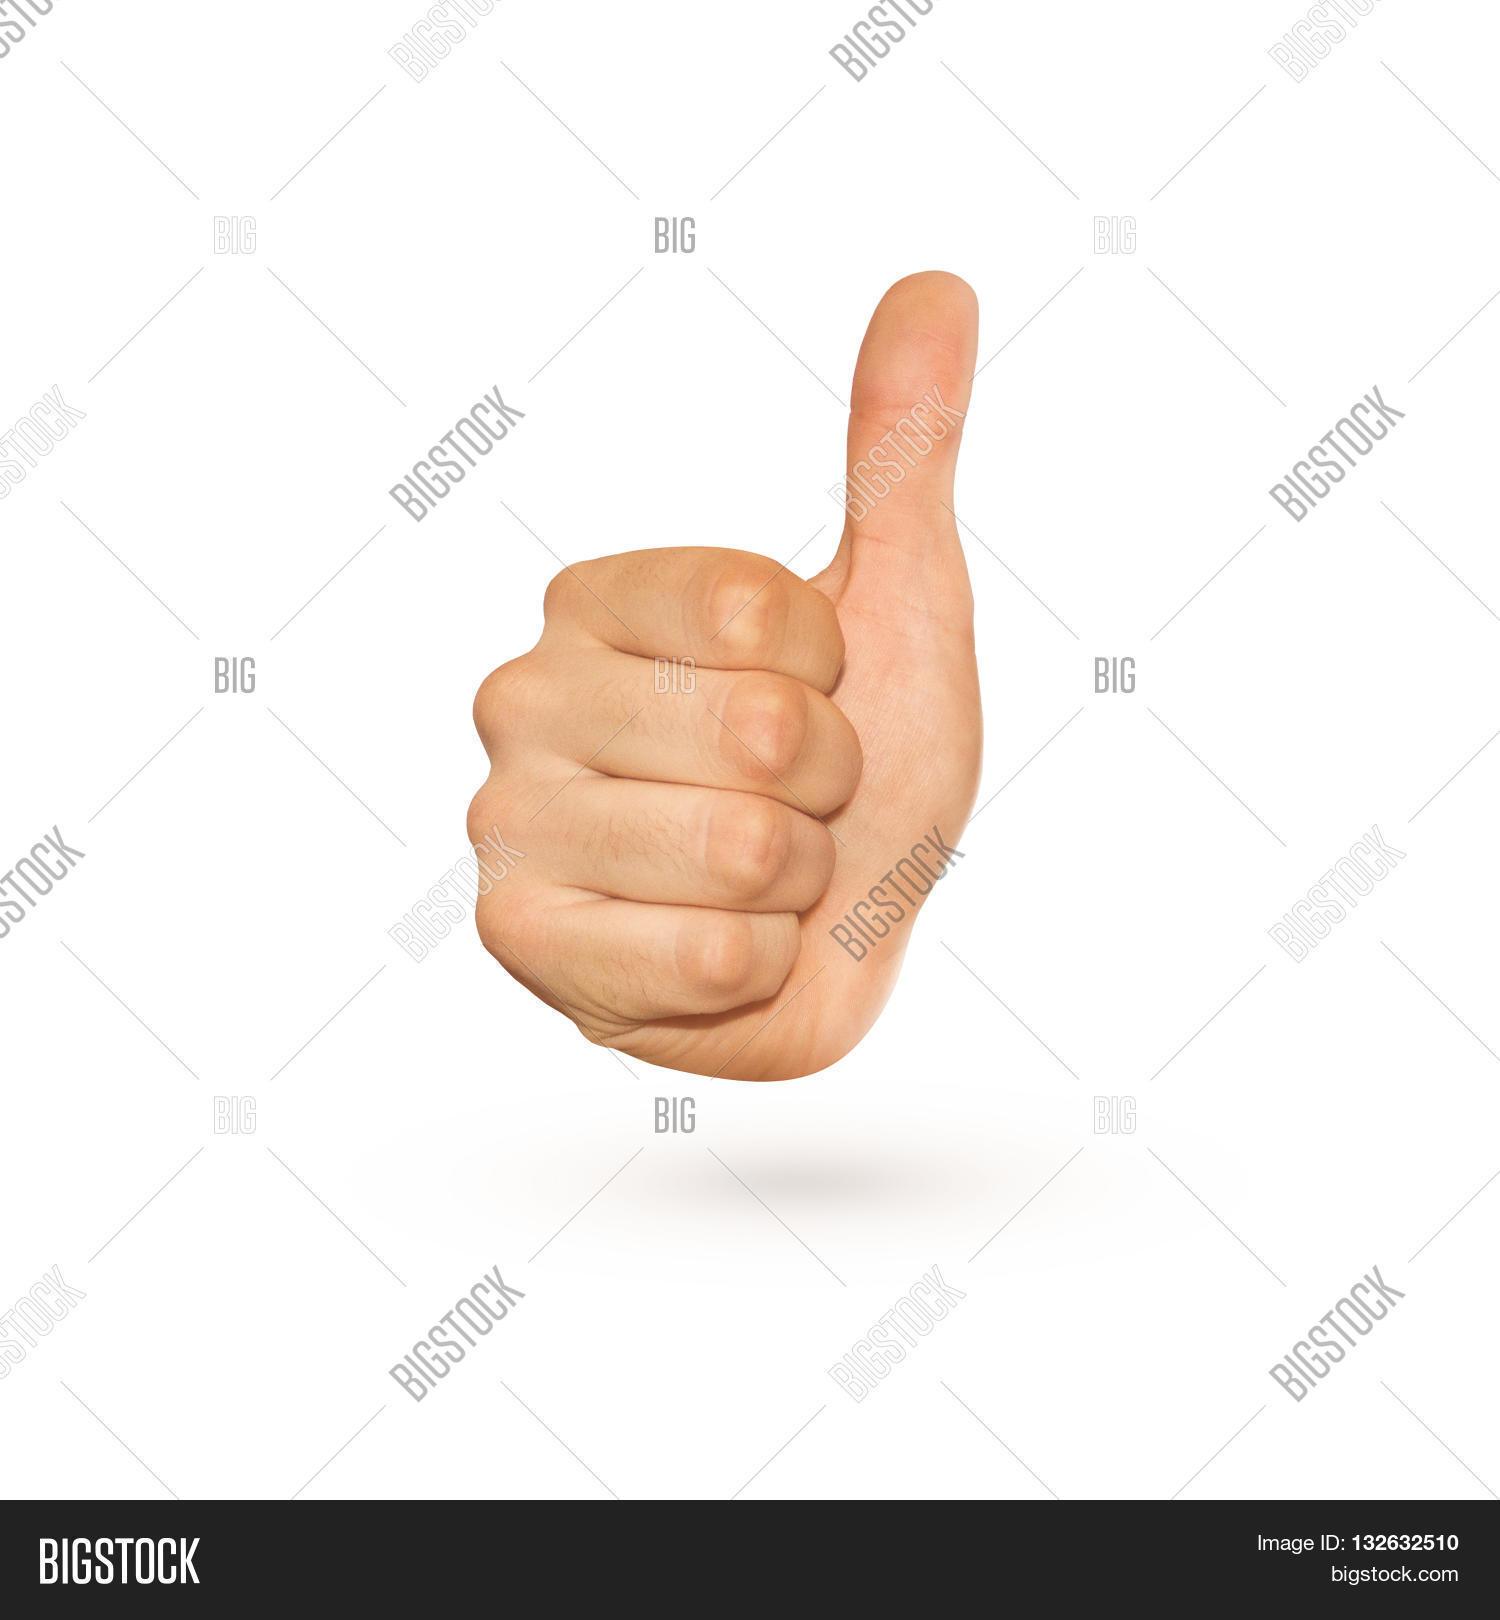 Icon Thumb Sign Image Photo Free Trial Bigstock